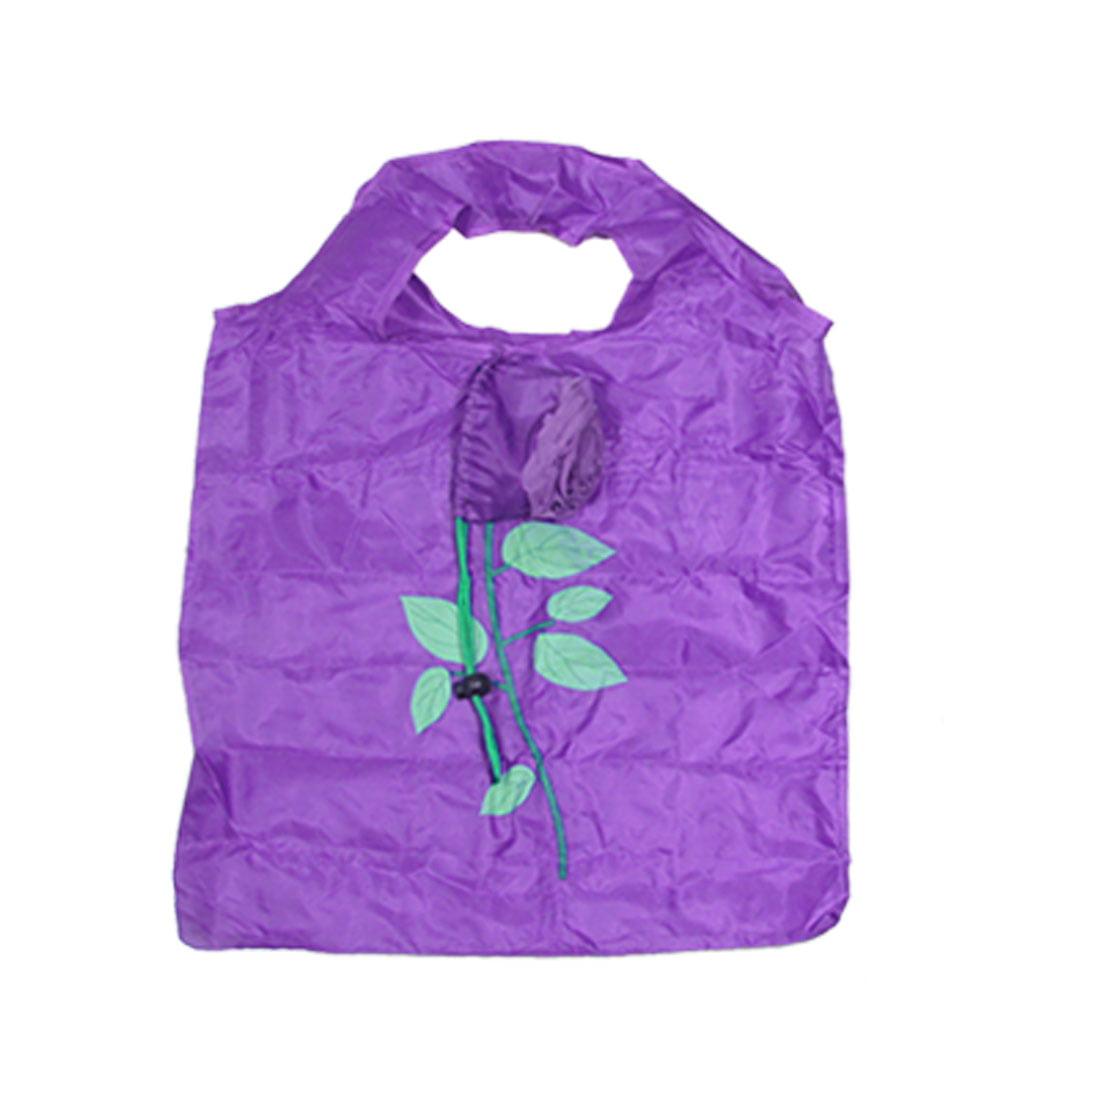 Supermarket Shopping Nylon Purple Rose Tote Handbag